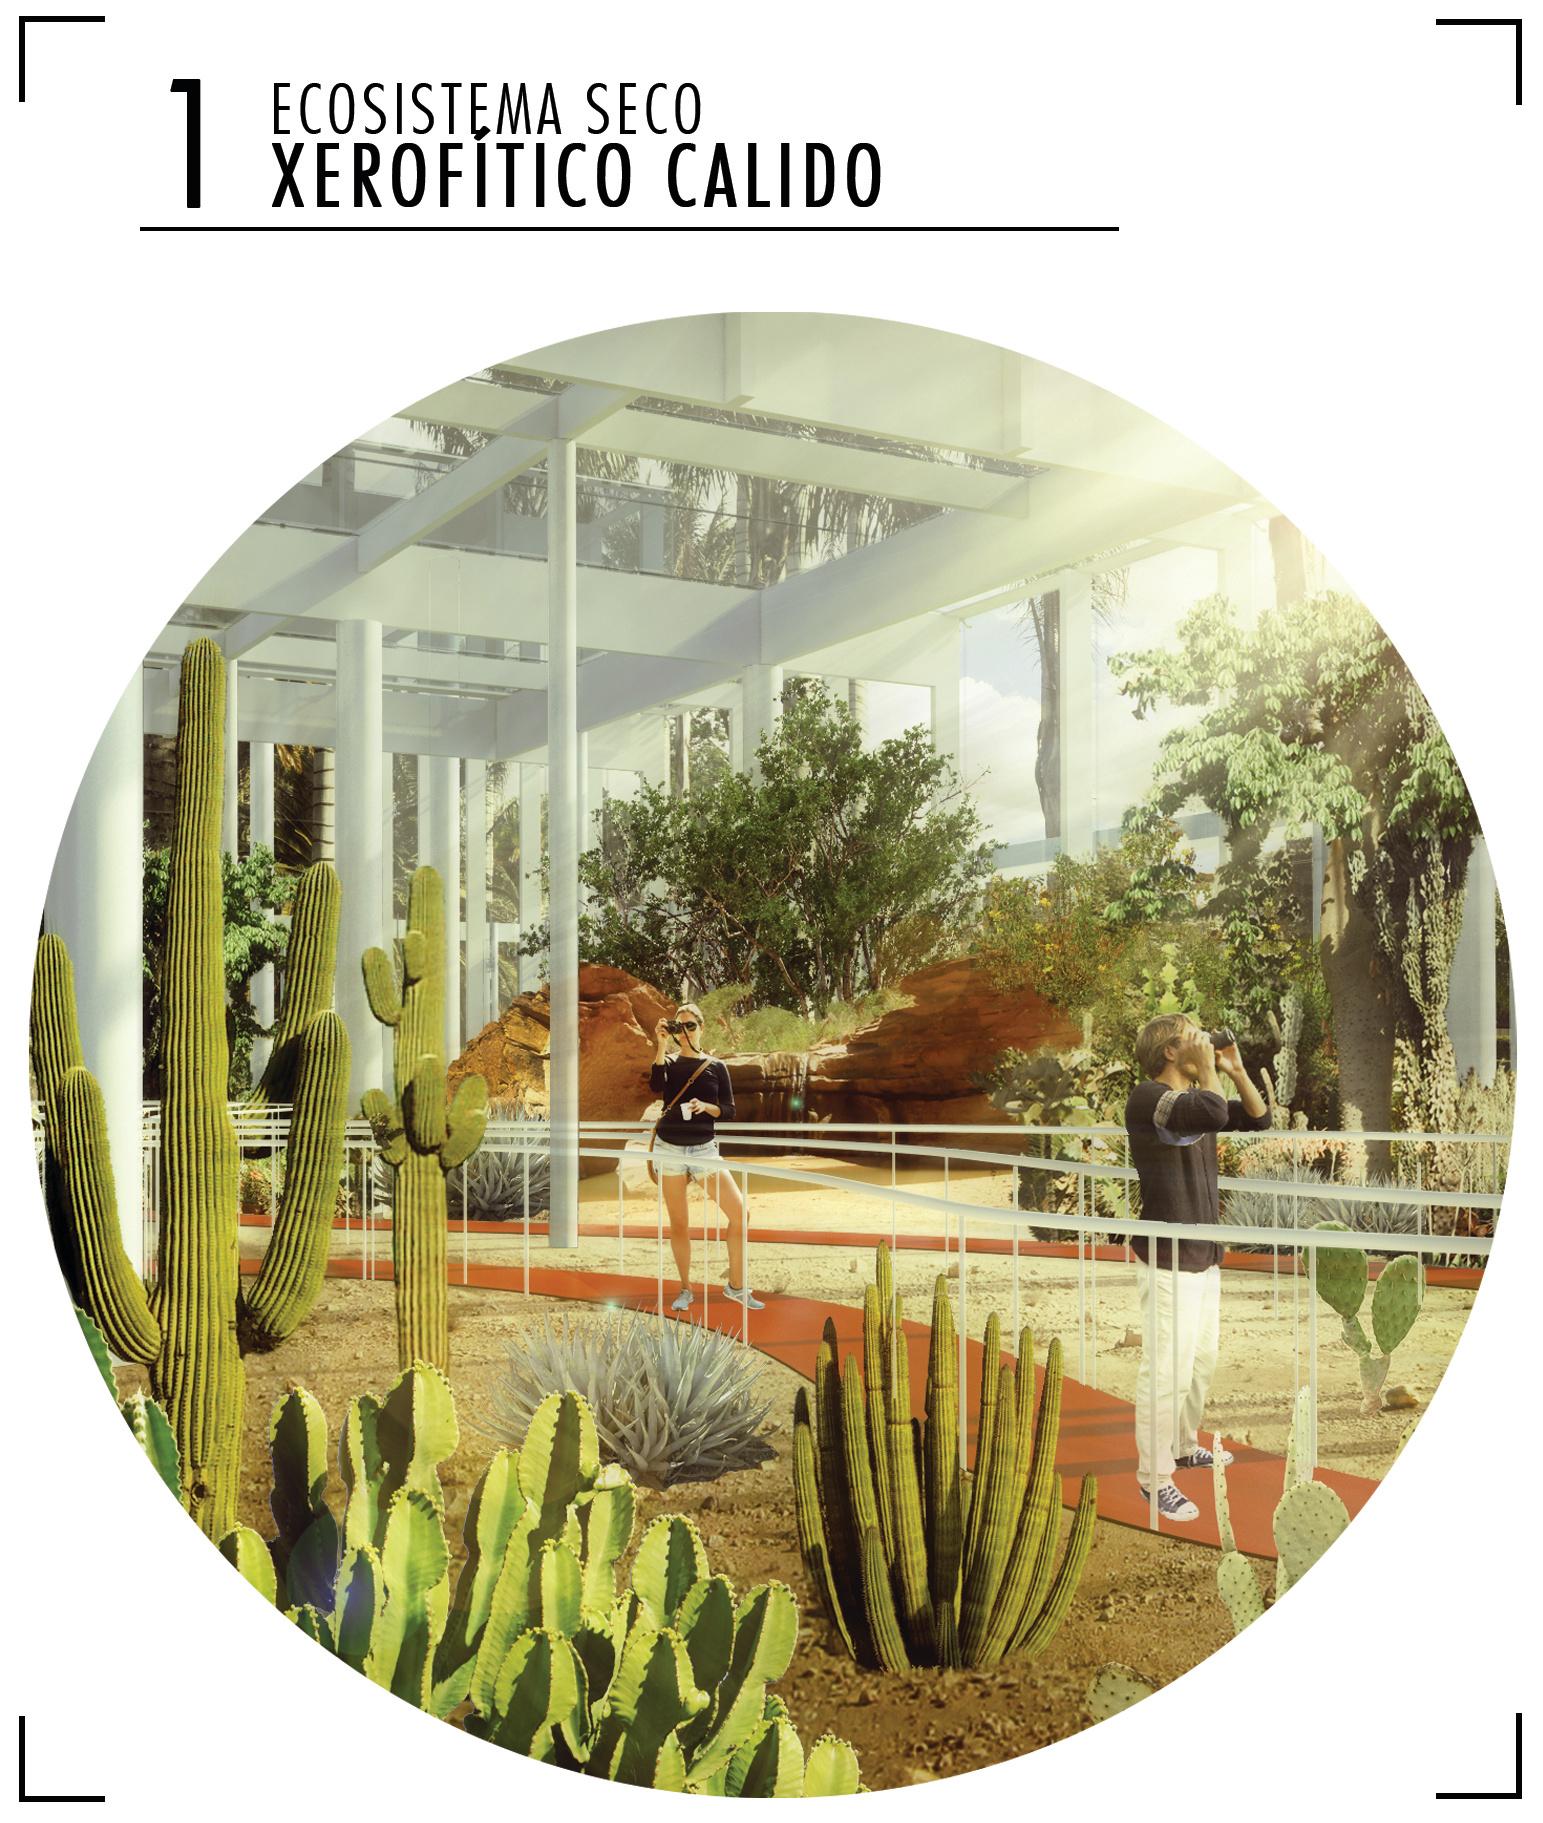 Ecosistema_seca_xerofítico_seco